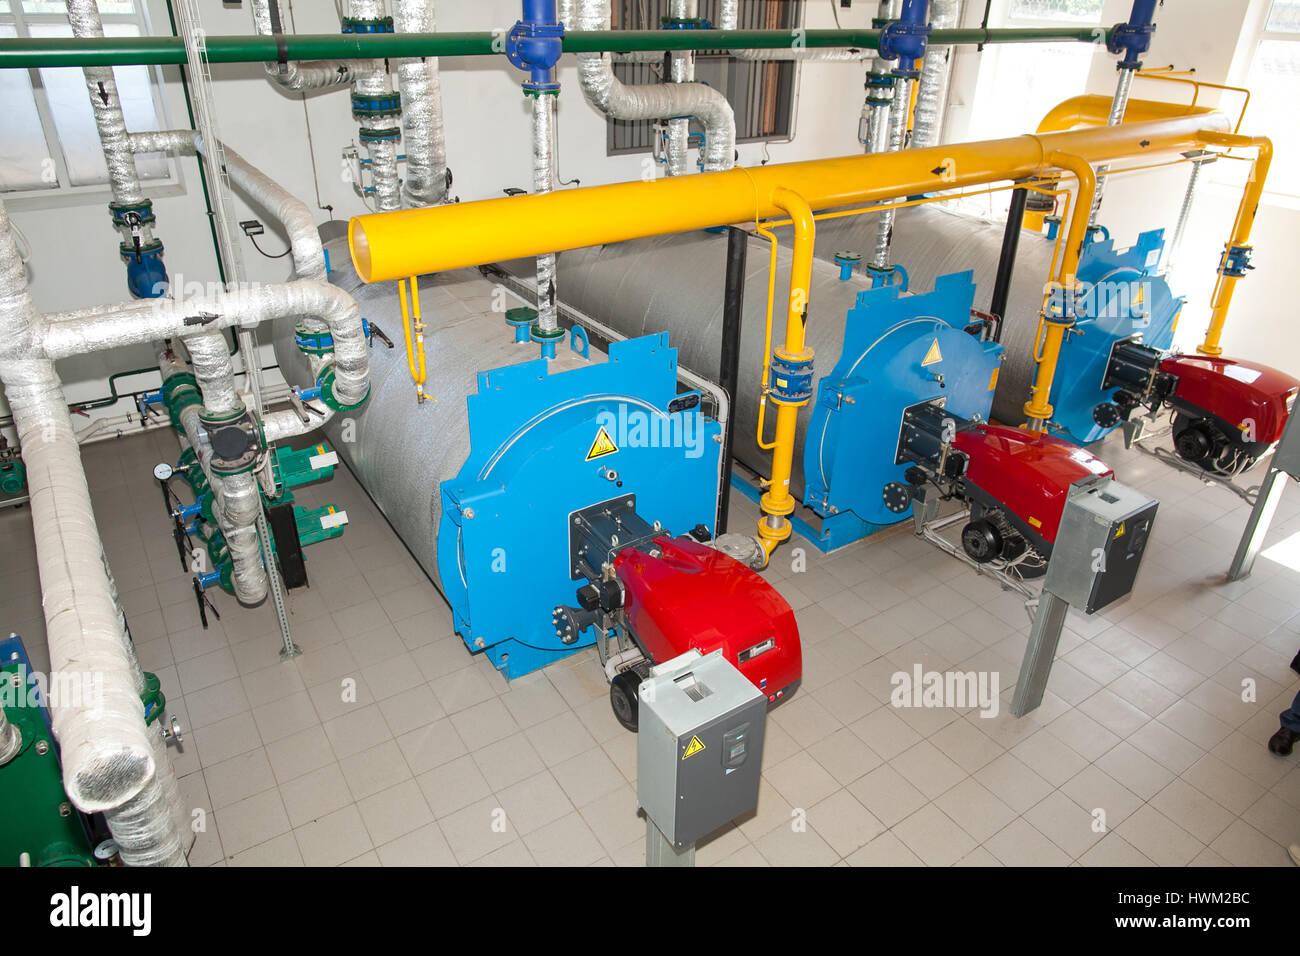 Industrial Gas Boiler Pipe Work Stock Photos & Industrial Gas Boiler ...